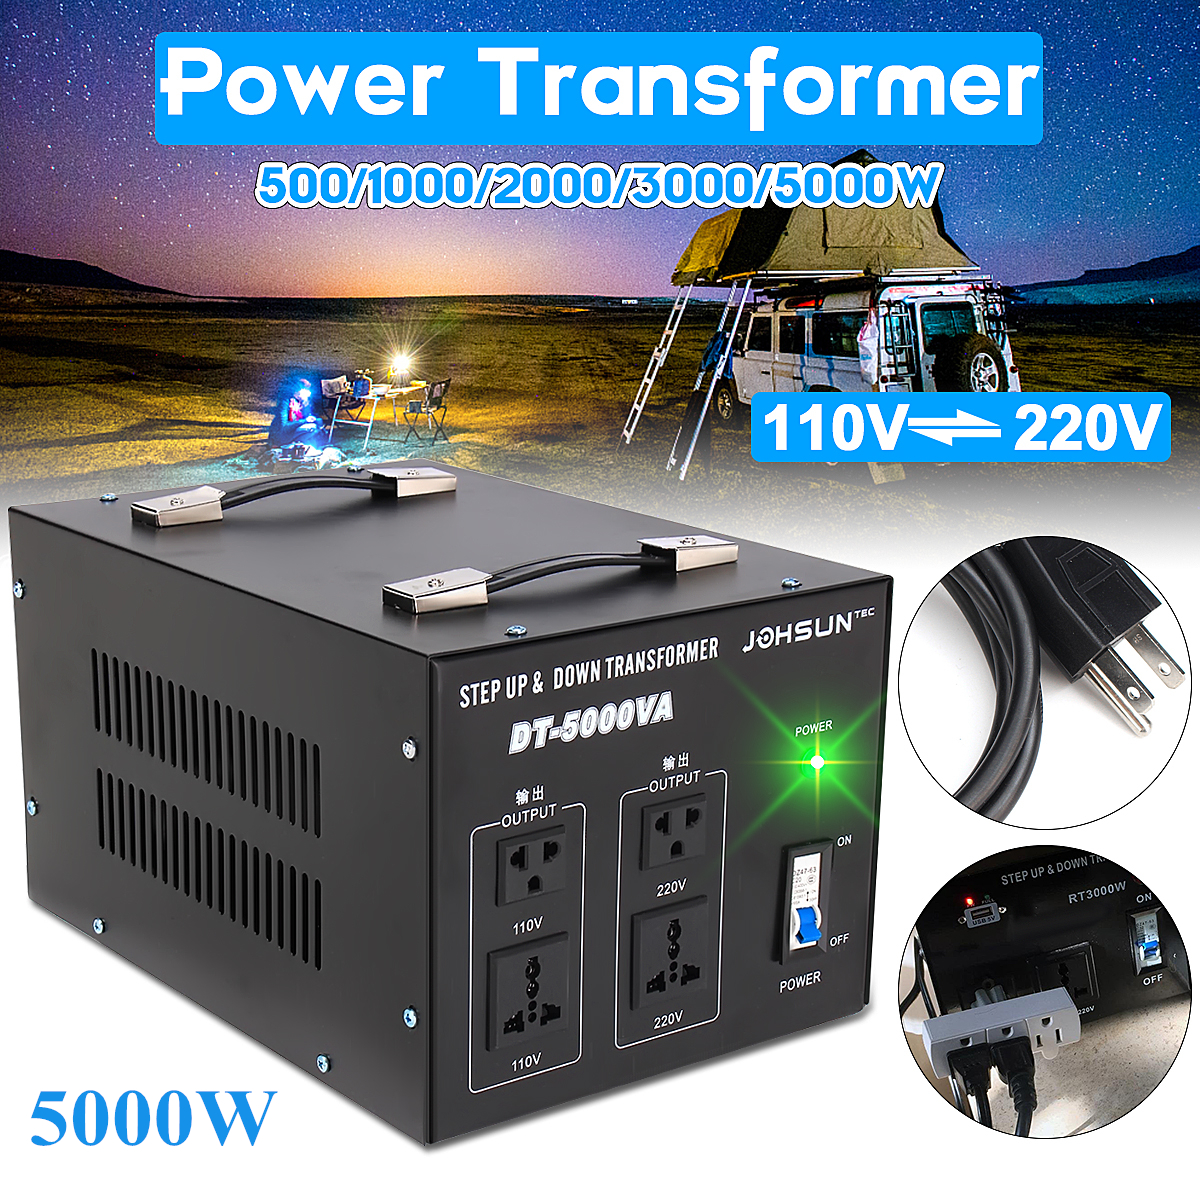 500/1000/2000/3000/5000 W Heavy Напряжение регулятор конвертер Мощность трансформатор 220 V auf 110 V конвертер